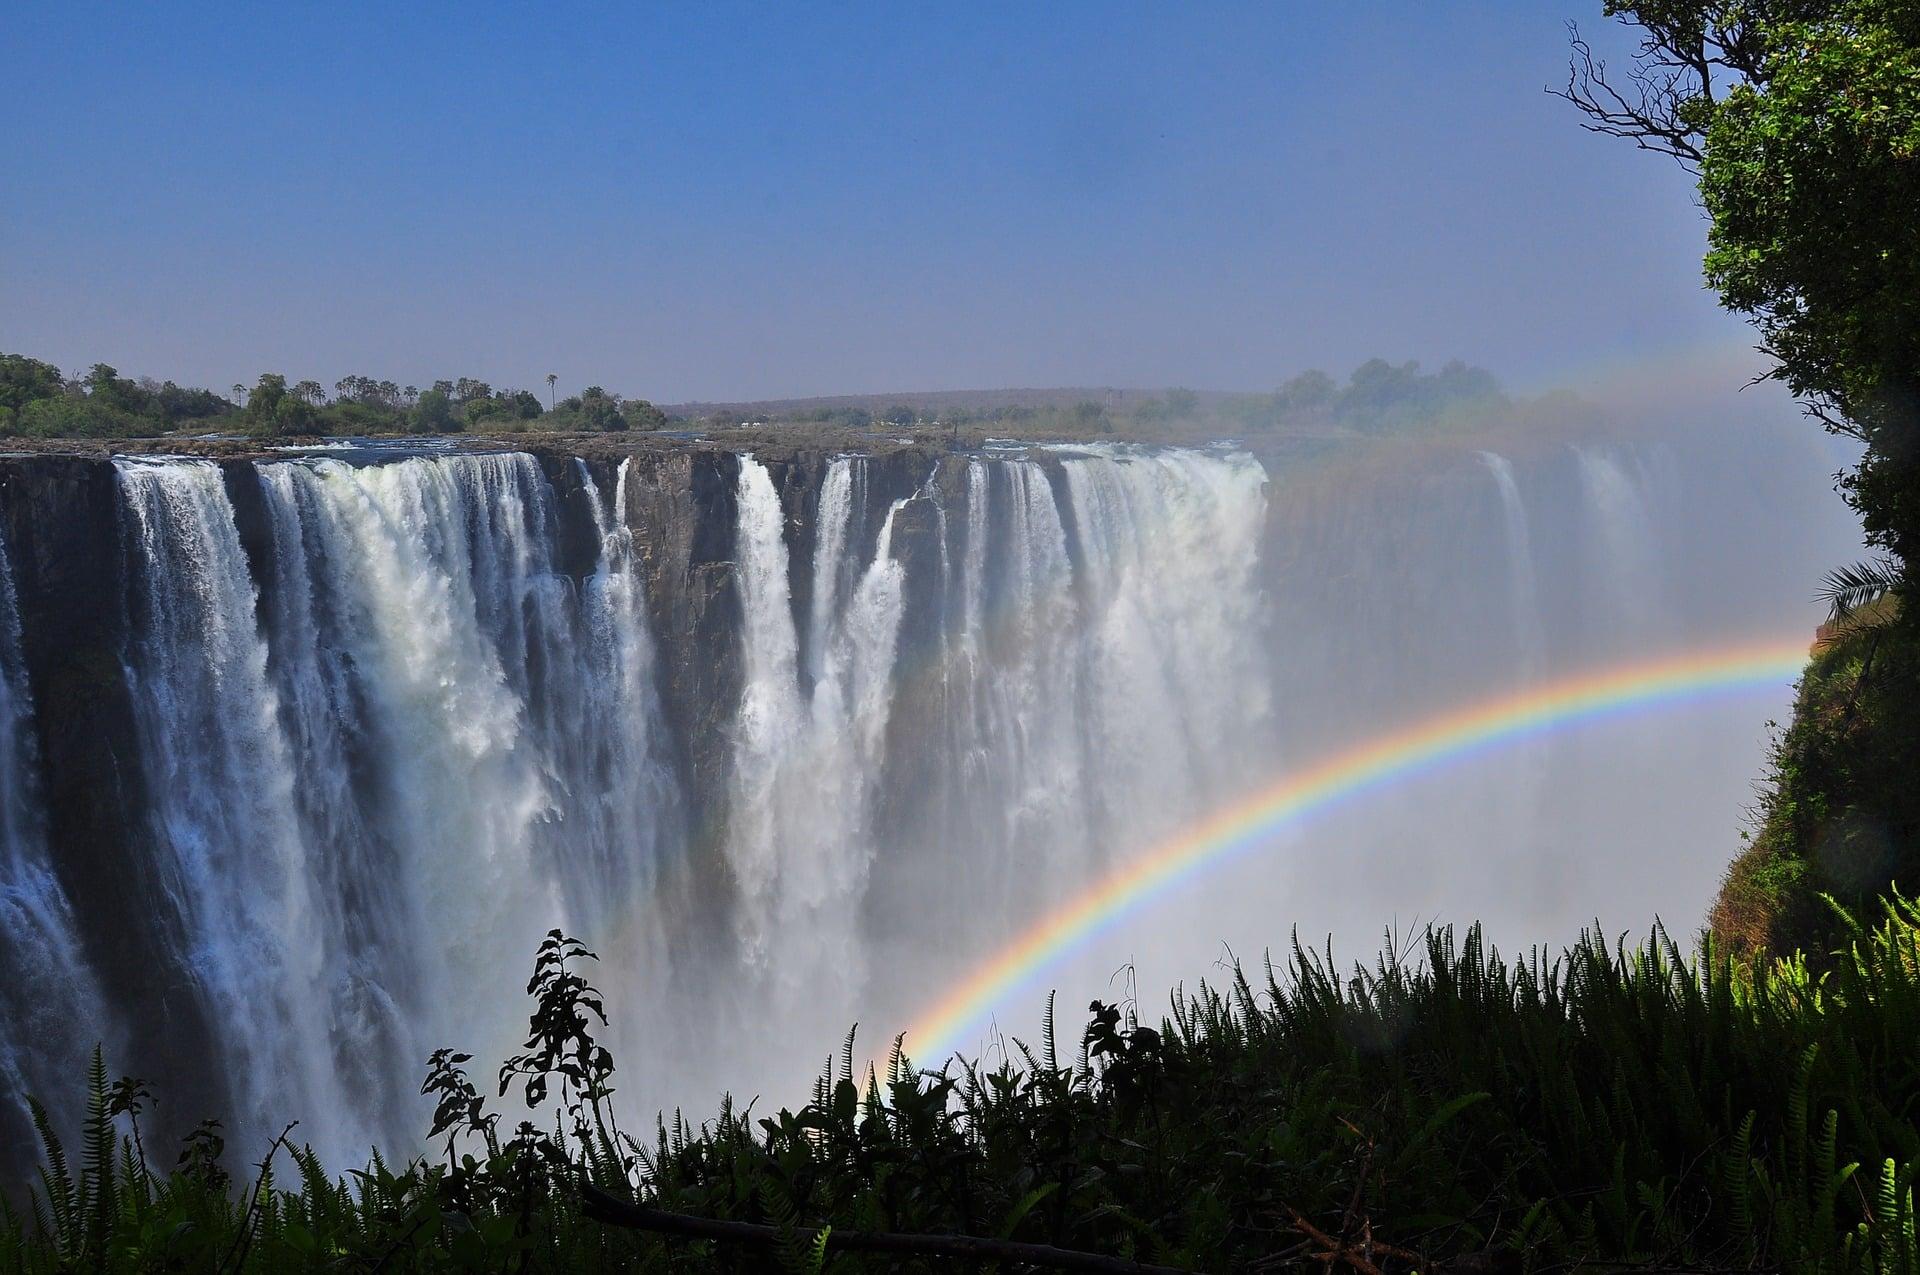 viatge a sud-àfrica en grup